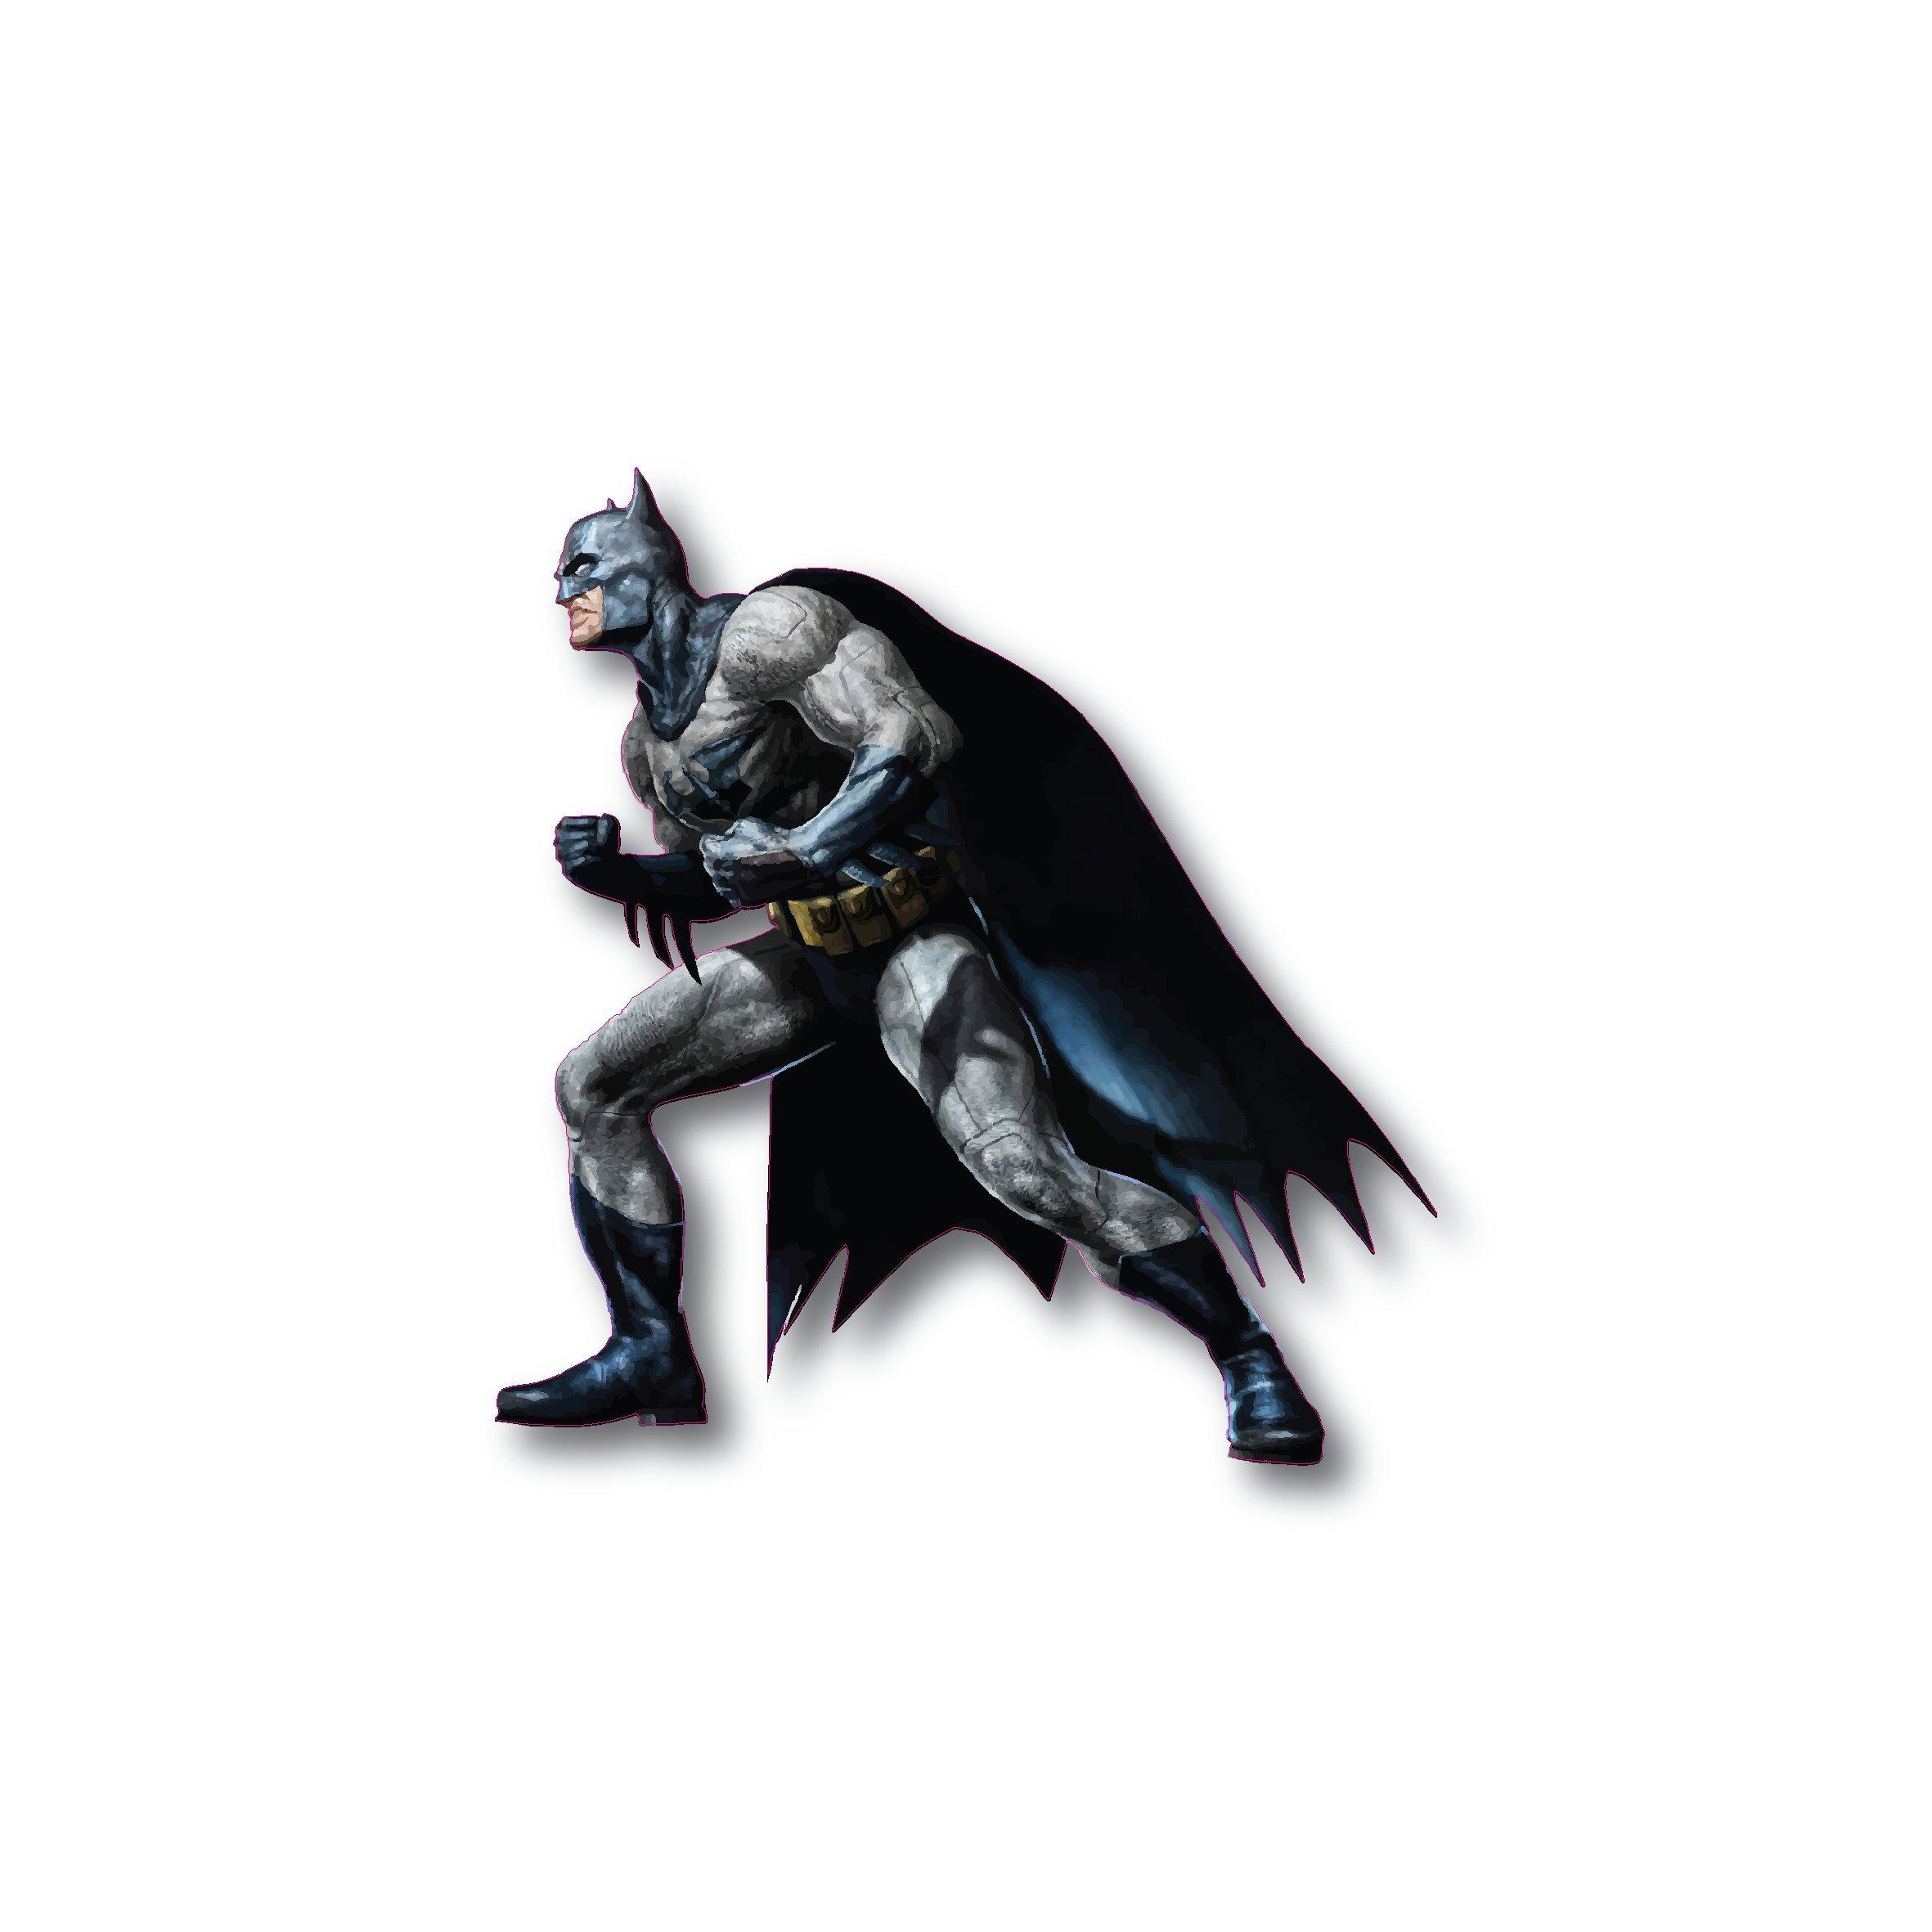 Batman Ironman Superman Flying ironman macbook sticker marvel sticker Spiderman by decorsfuk.co decals for macbook